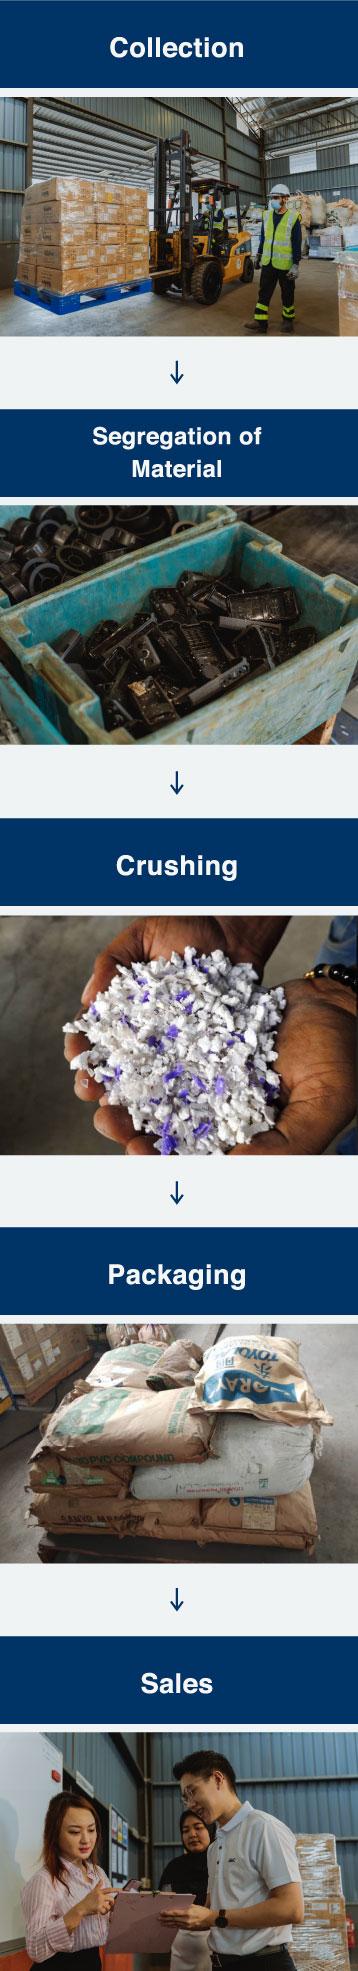 MM Century- Plastic Waste Disposal, Plastic Waste Disposal Graph, Plastic Waste Disposal Management